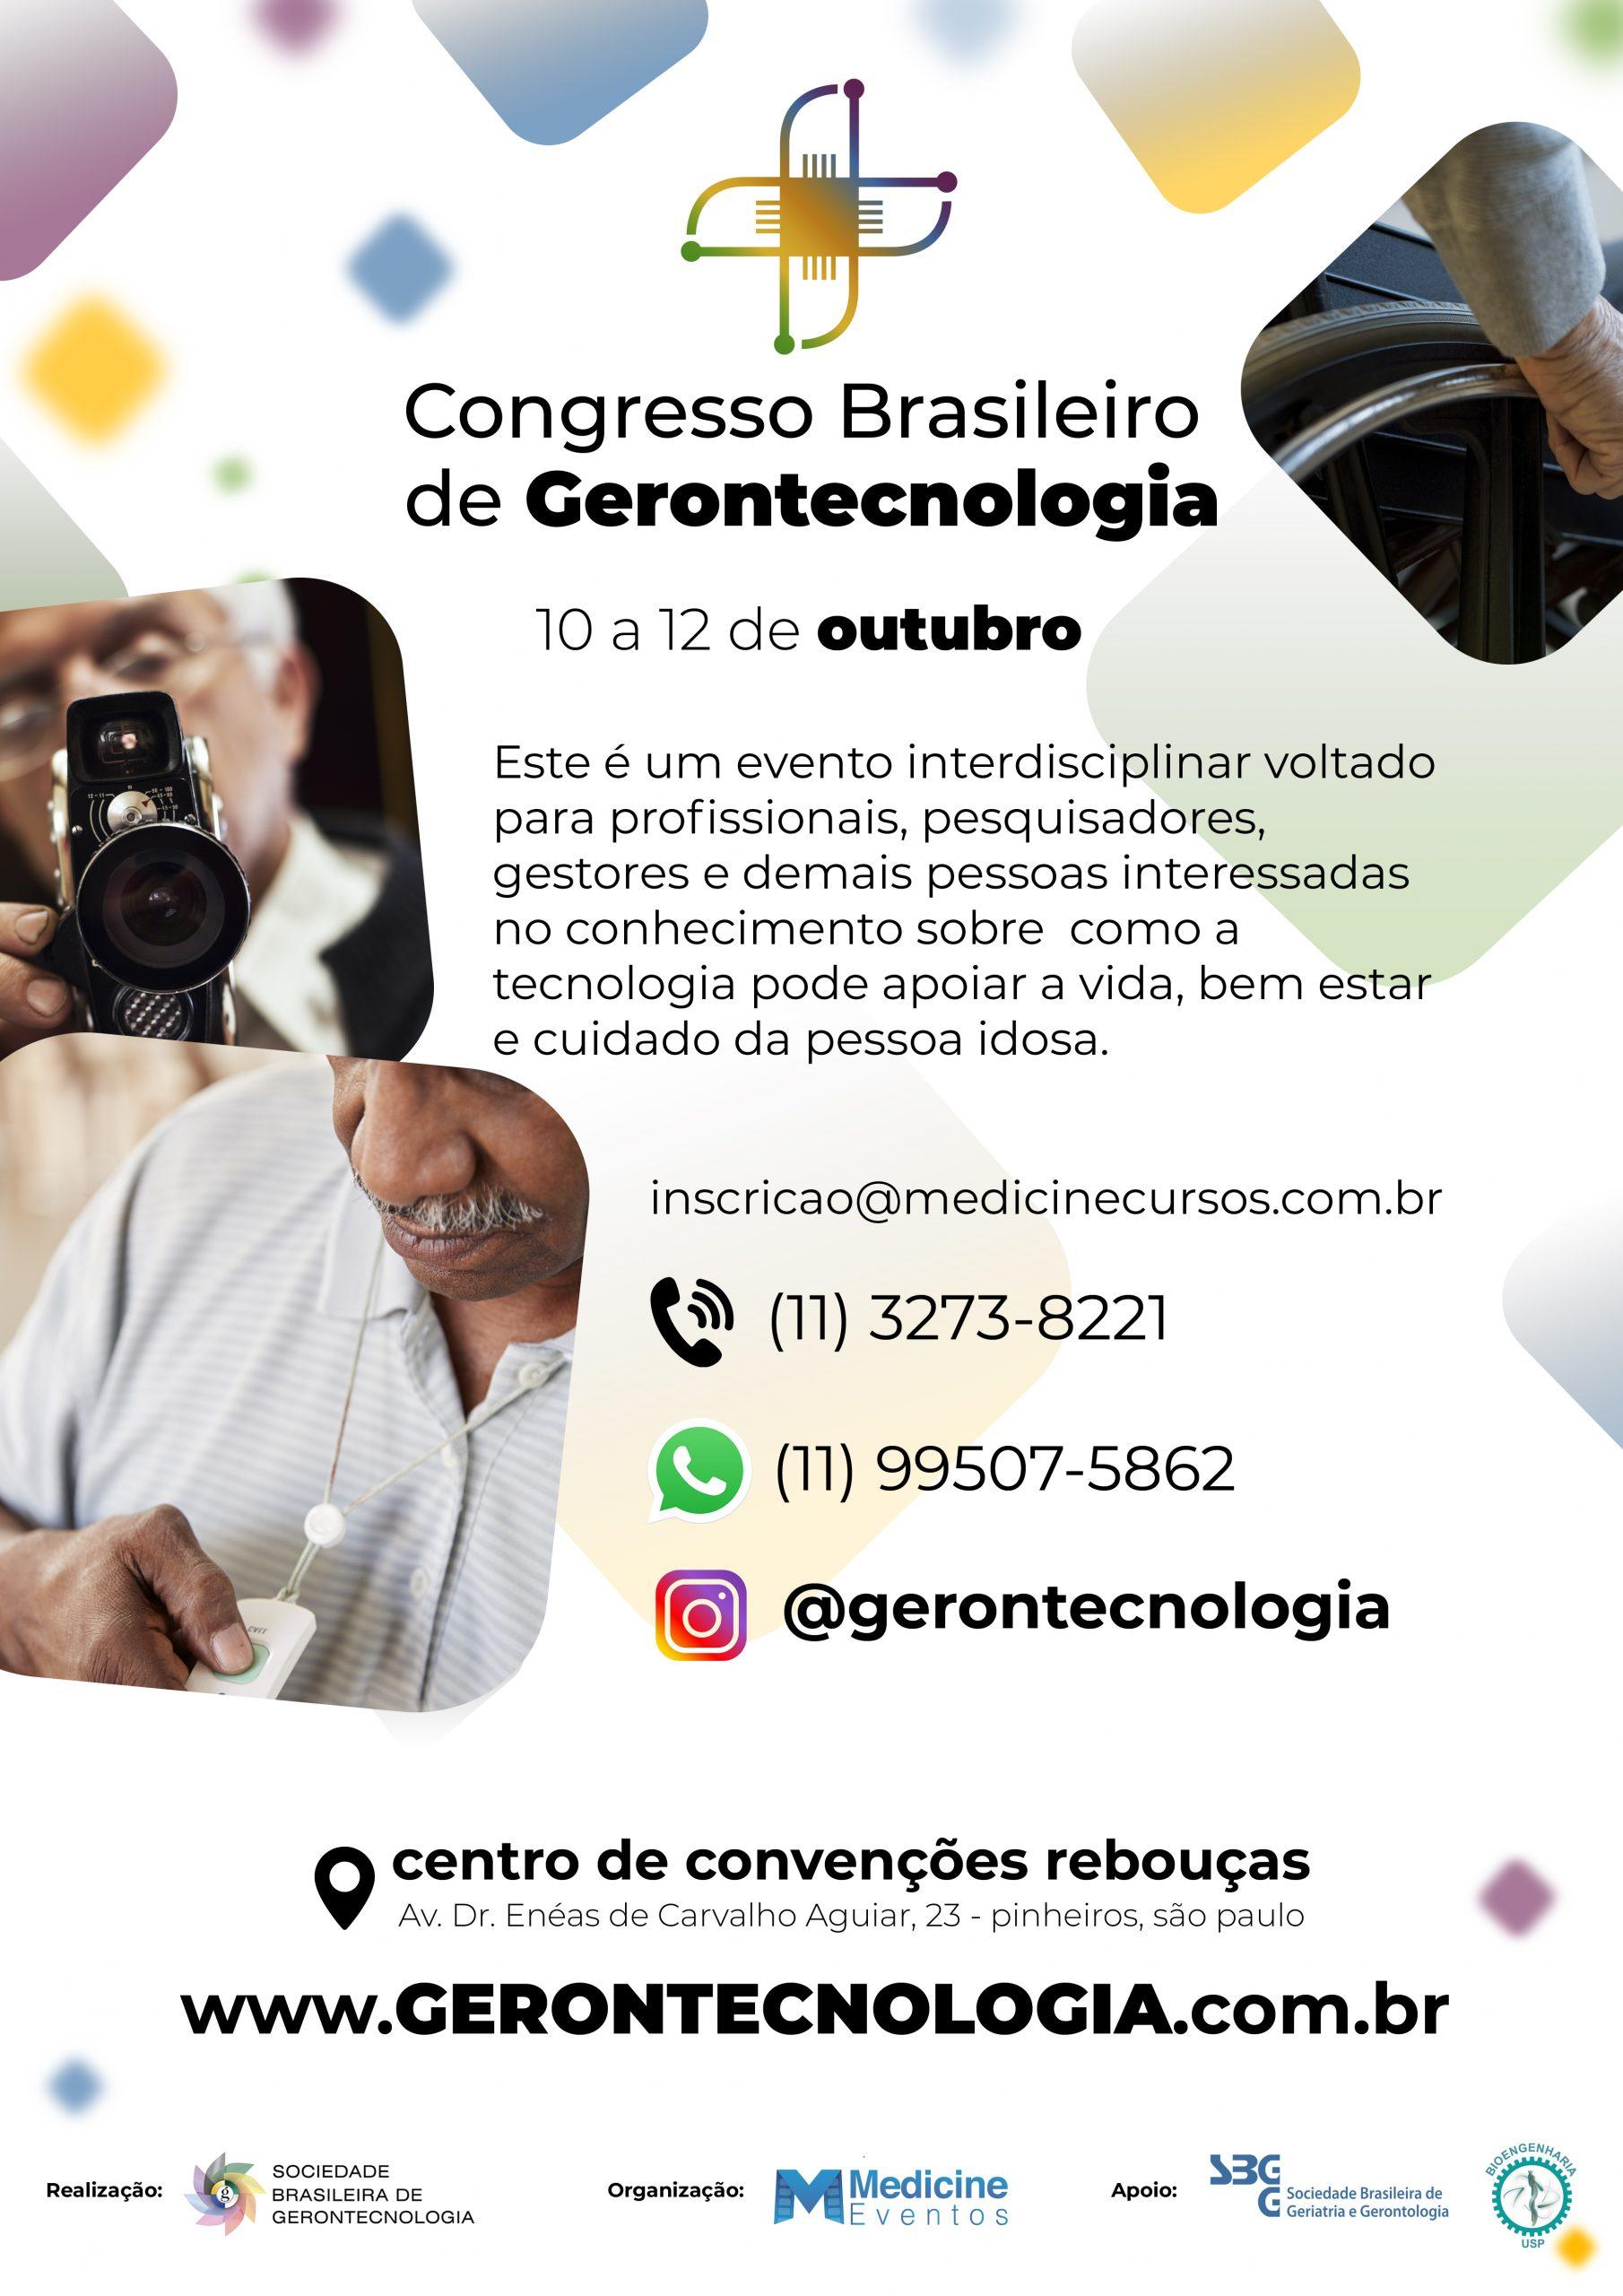 III Congresso Brasileiro de Gerontecnologia